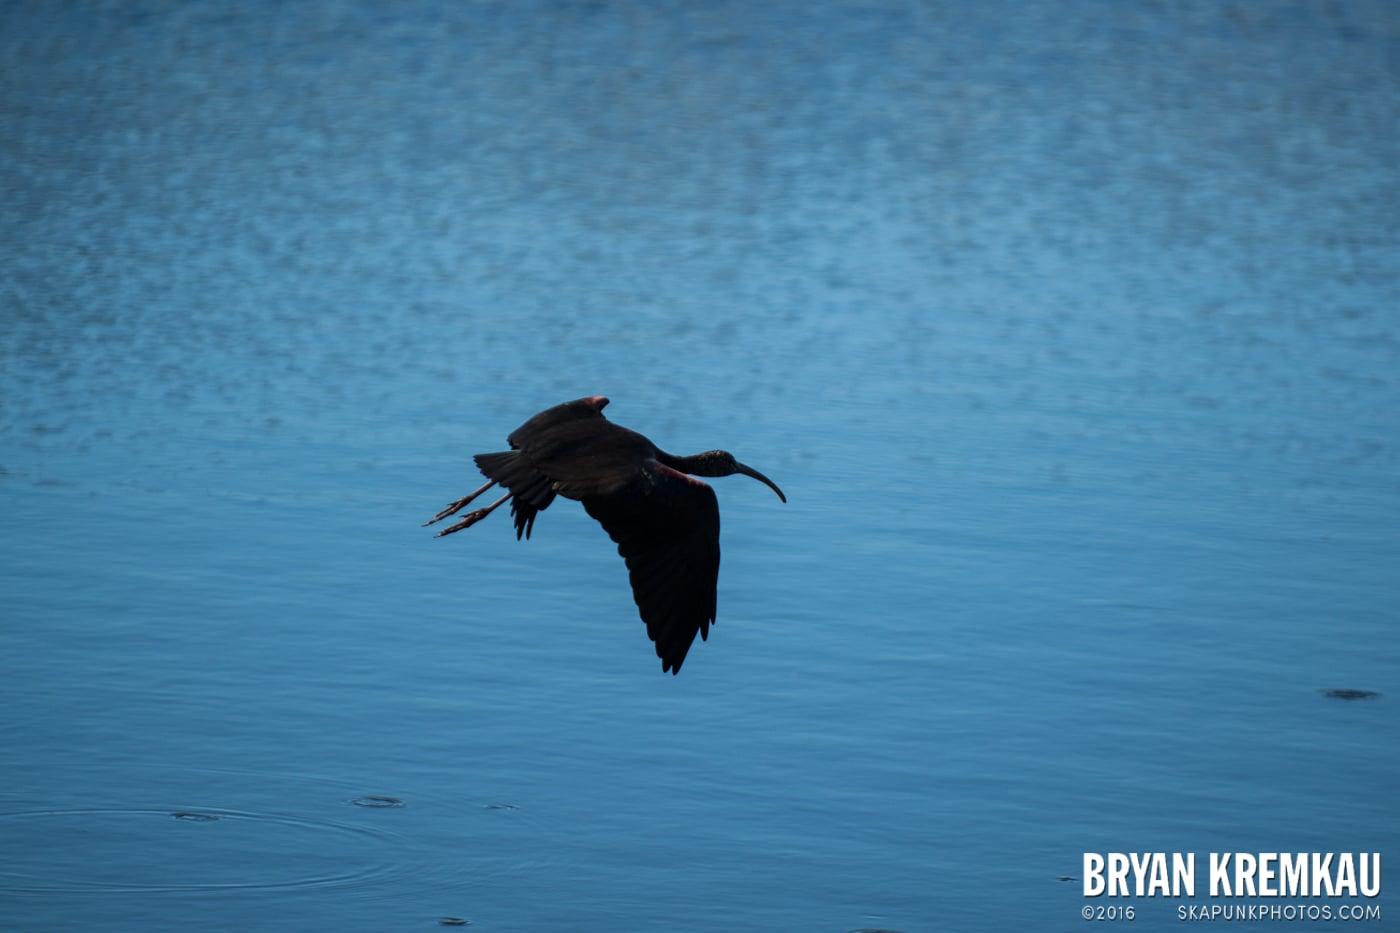 Sunsets, Astrophotography & Birds @ Venice, Florida - 10.25.14 - 11.5.14 (68)